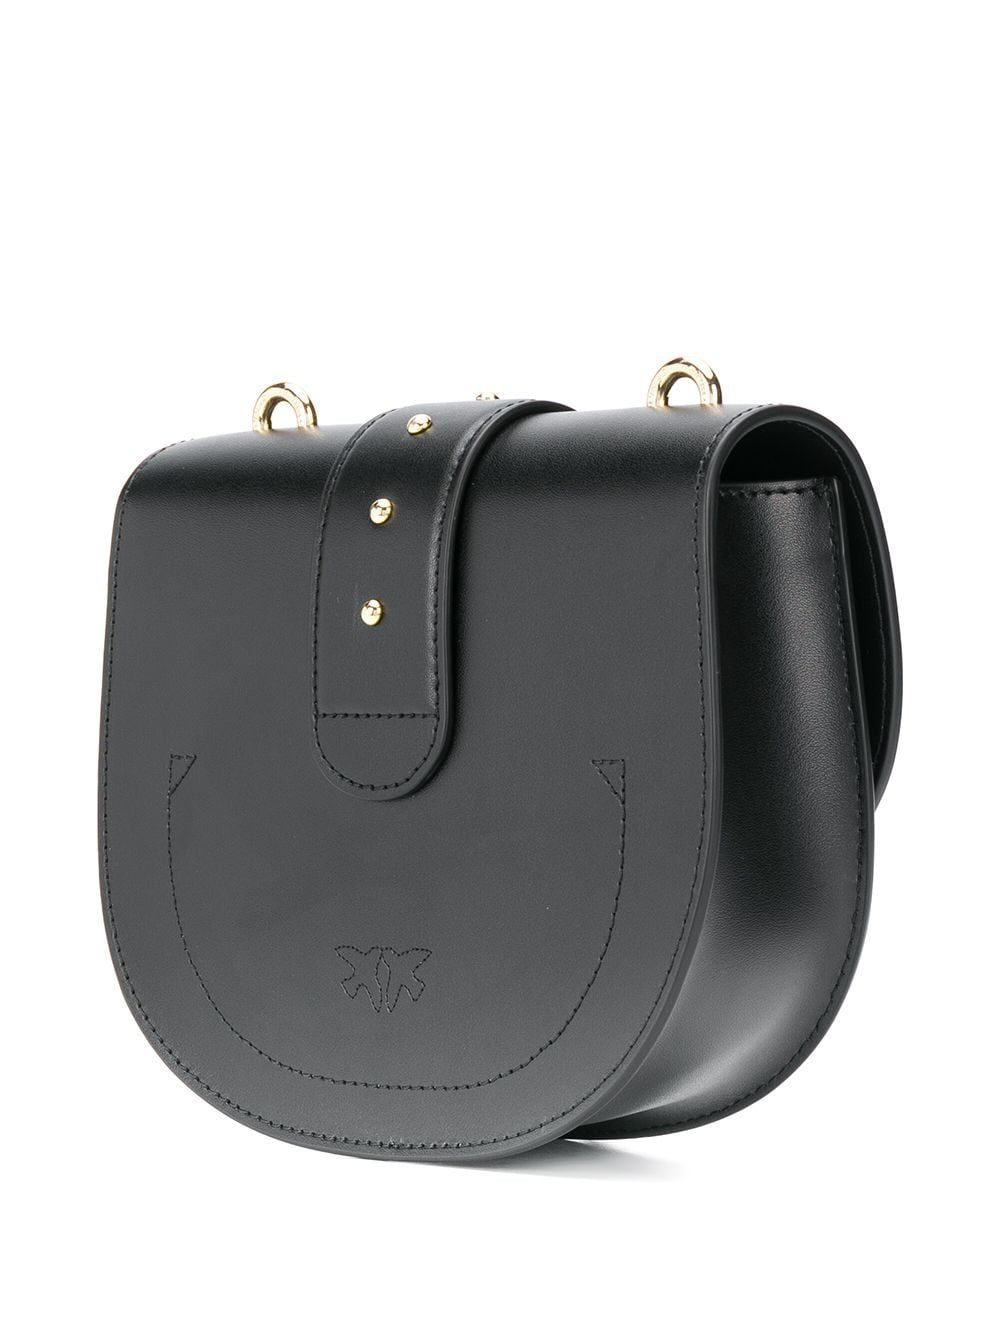 PINKO WOMEN'S 1P21KPY5FFZ99 BLACK LEATHER SHOULDER BAG